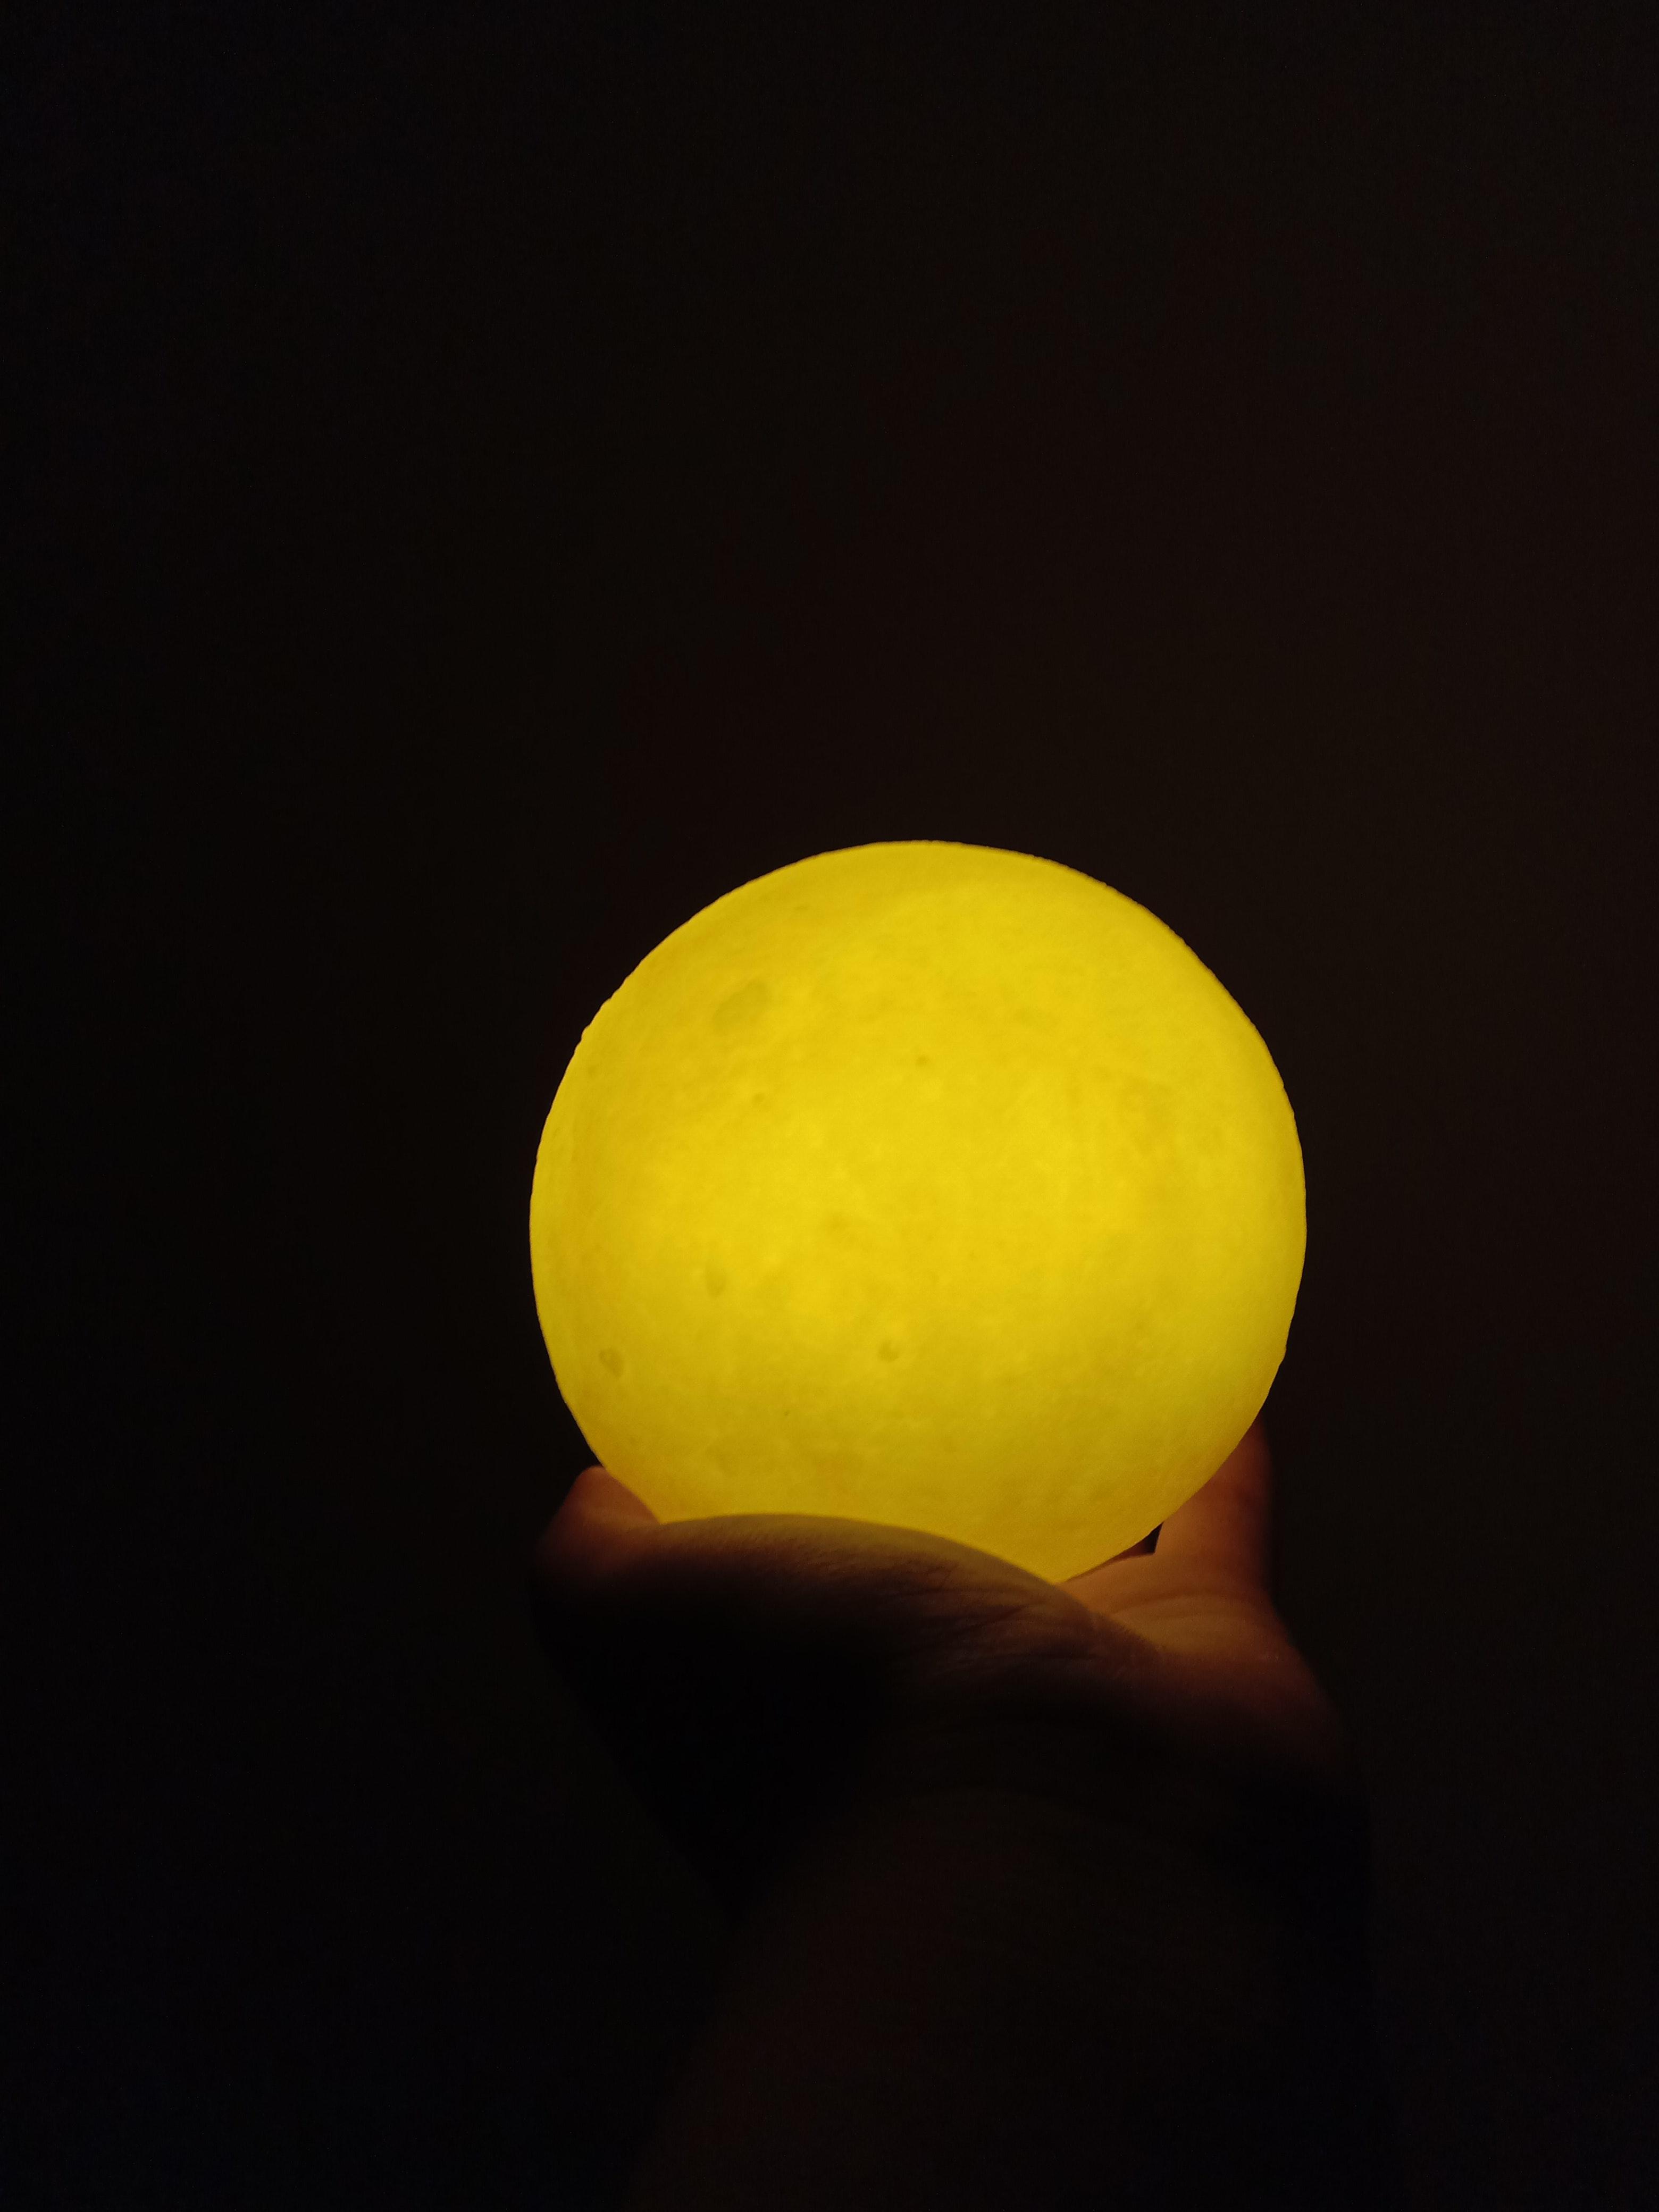 Free stock photo of light, moon